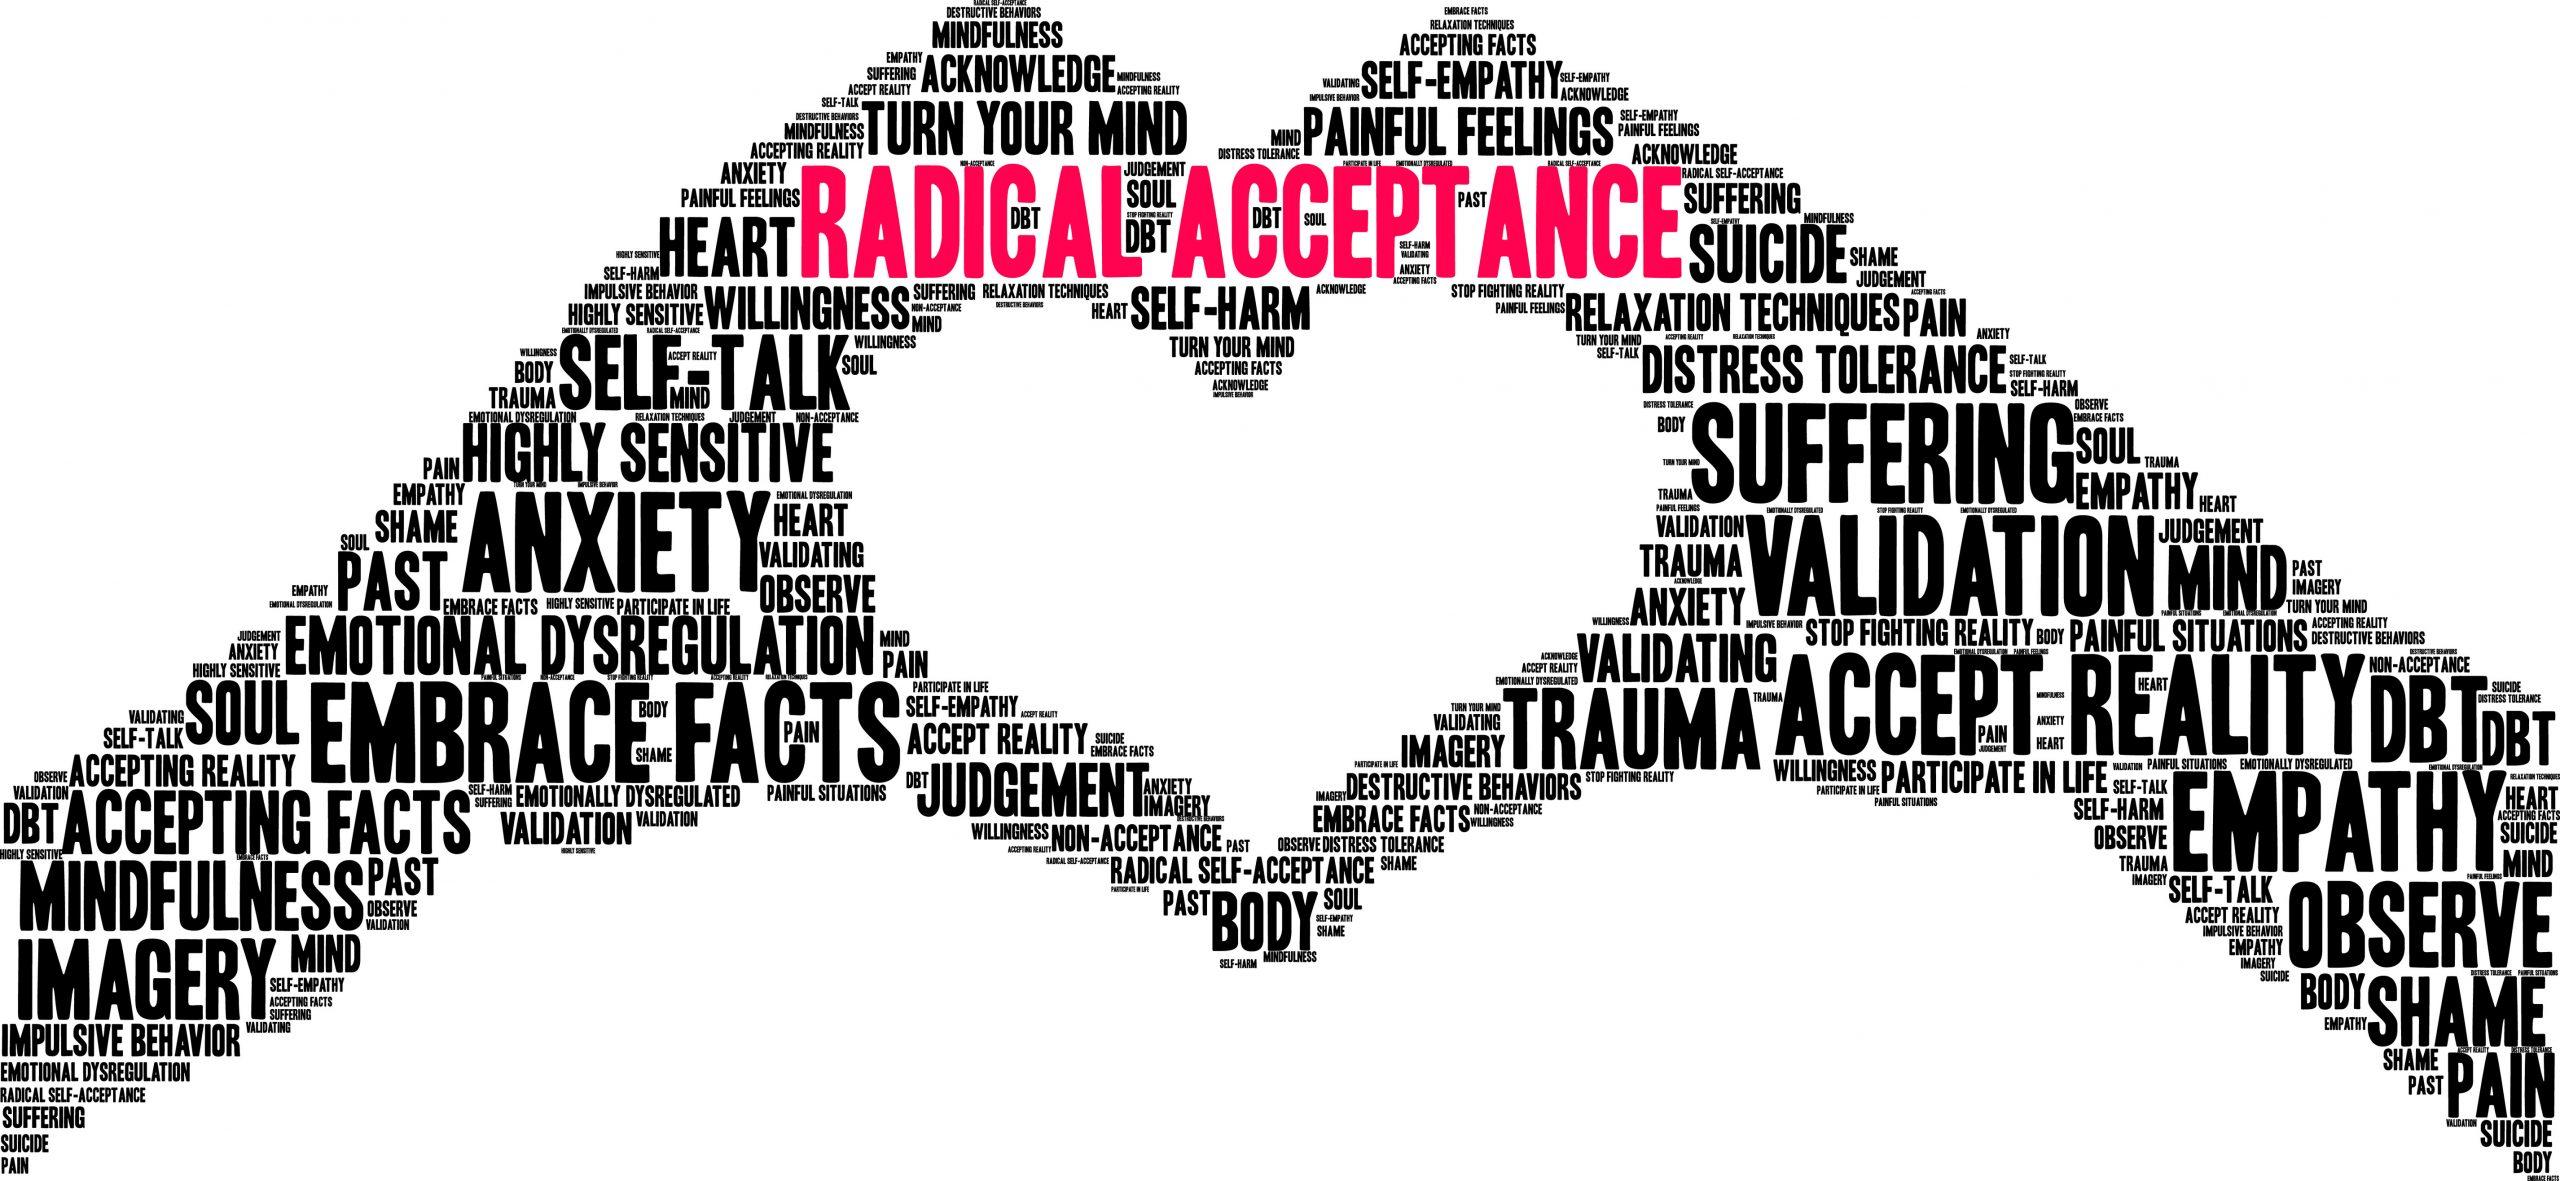 Radical Acceptance tolerating distress through DBT